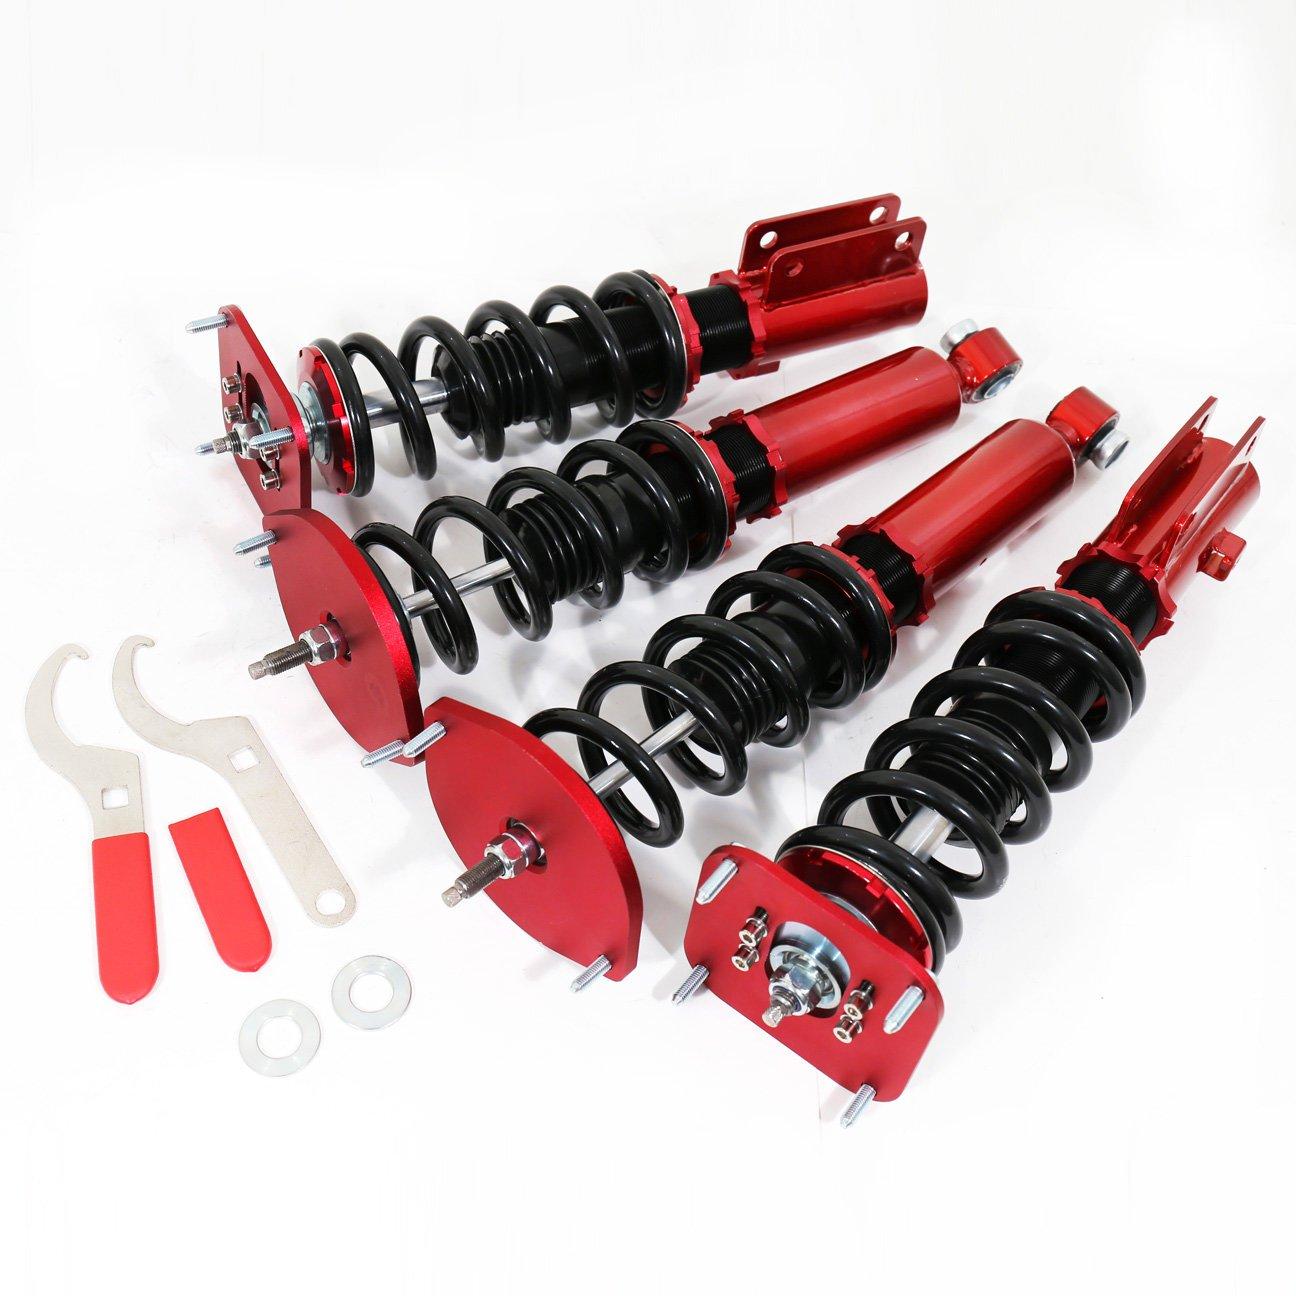 AJP Distributors Suspension Full Adjustable Lowering Spring Shocks Strut Coilover Dampers Kit Racing Red For Mazda Rx7 Rx-7 Fc